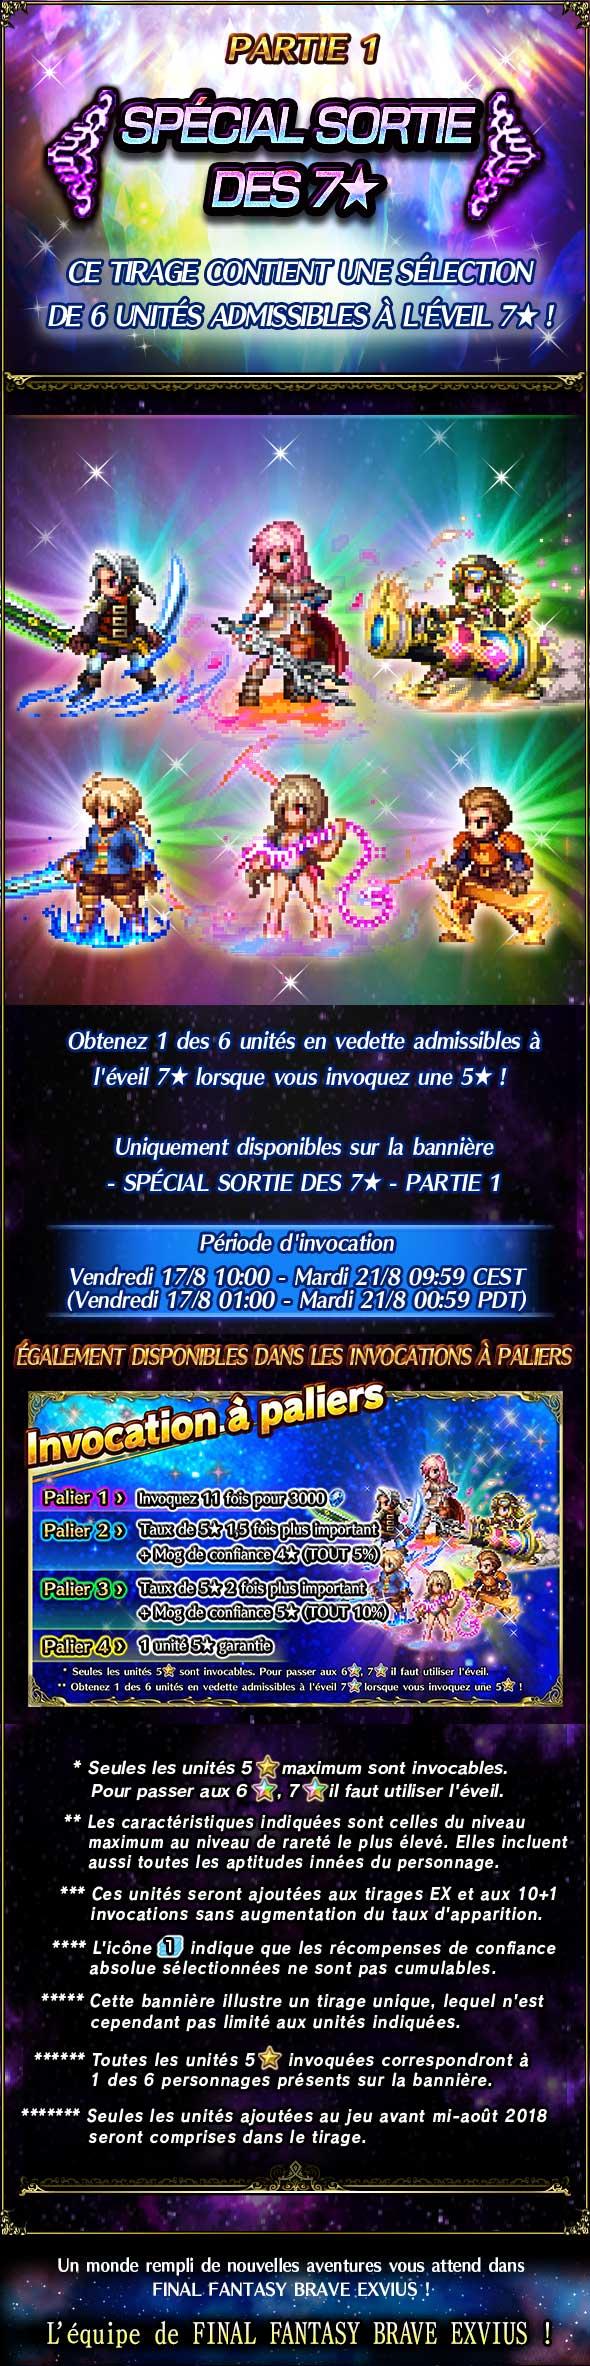 Invocations du moment - FFBE - Speciales sortie des 7* GachaPart1_Compilation